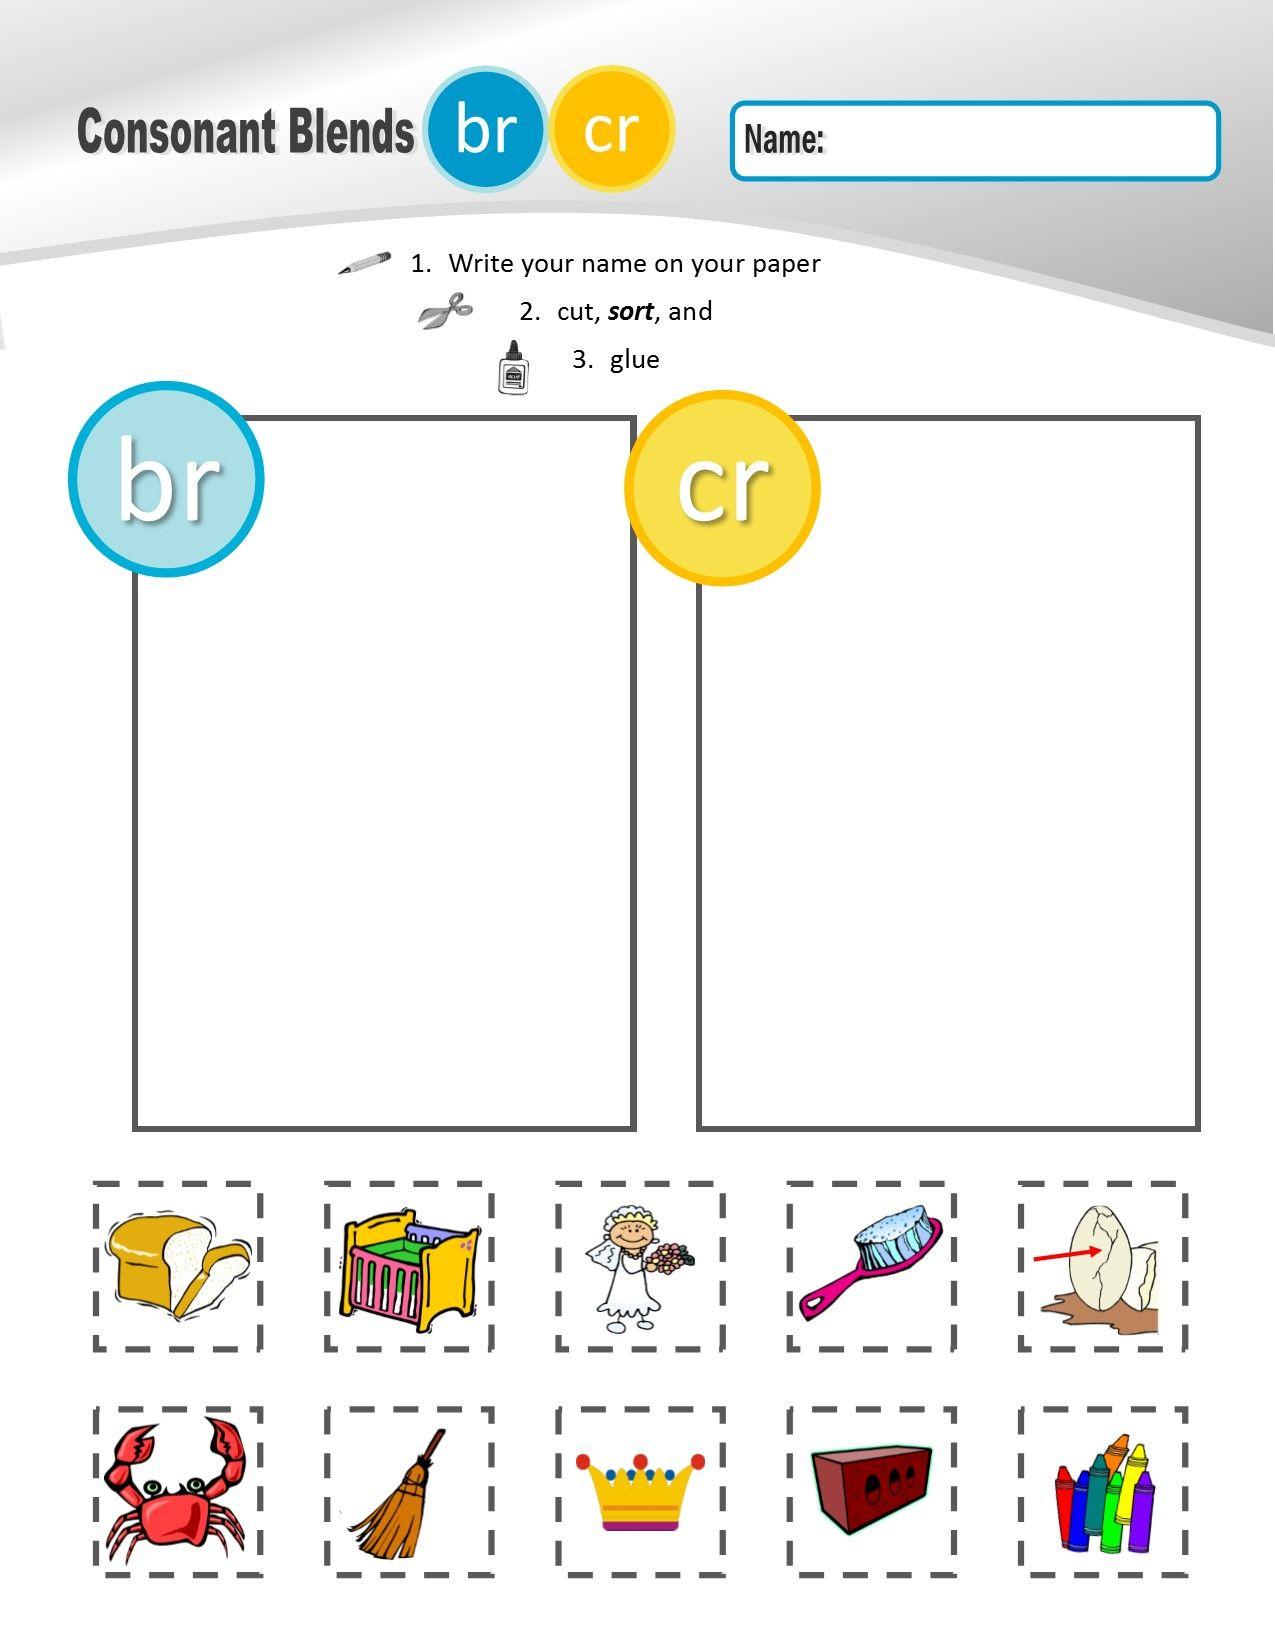 worksheet Consonant Blend Worksheets r family clusters brcrdrfrgrprtr 1 of 4 phonemic awareness consonant blends br cr dr fr gr pr tr sorting sheets